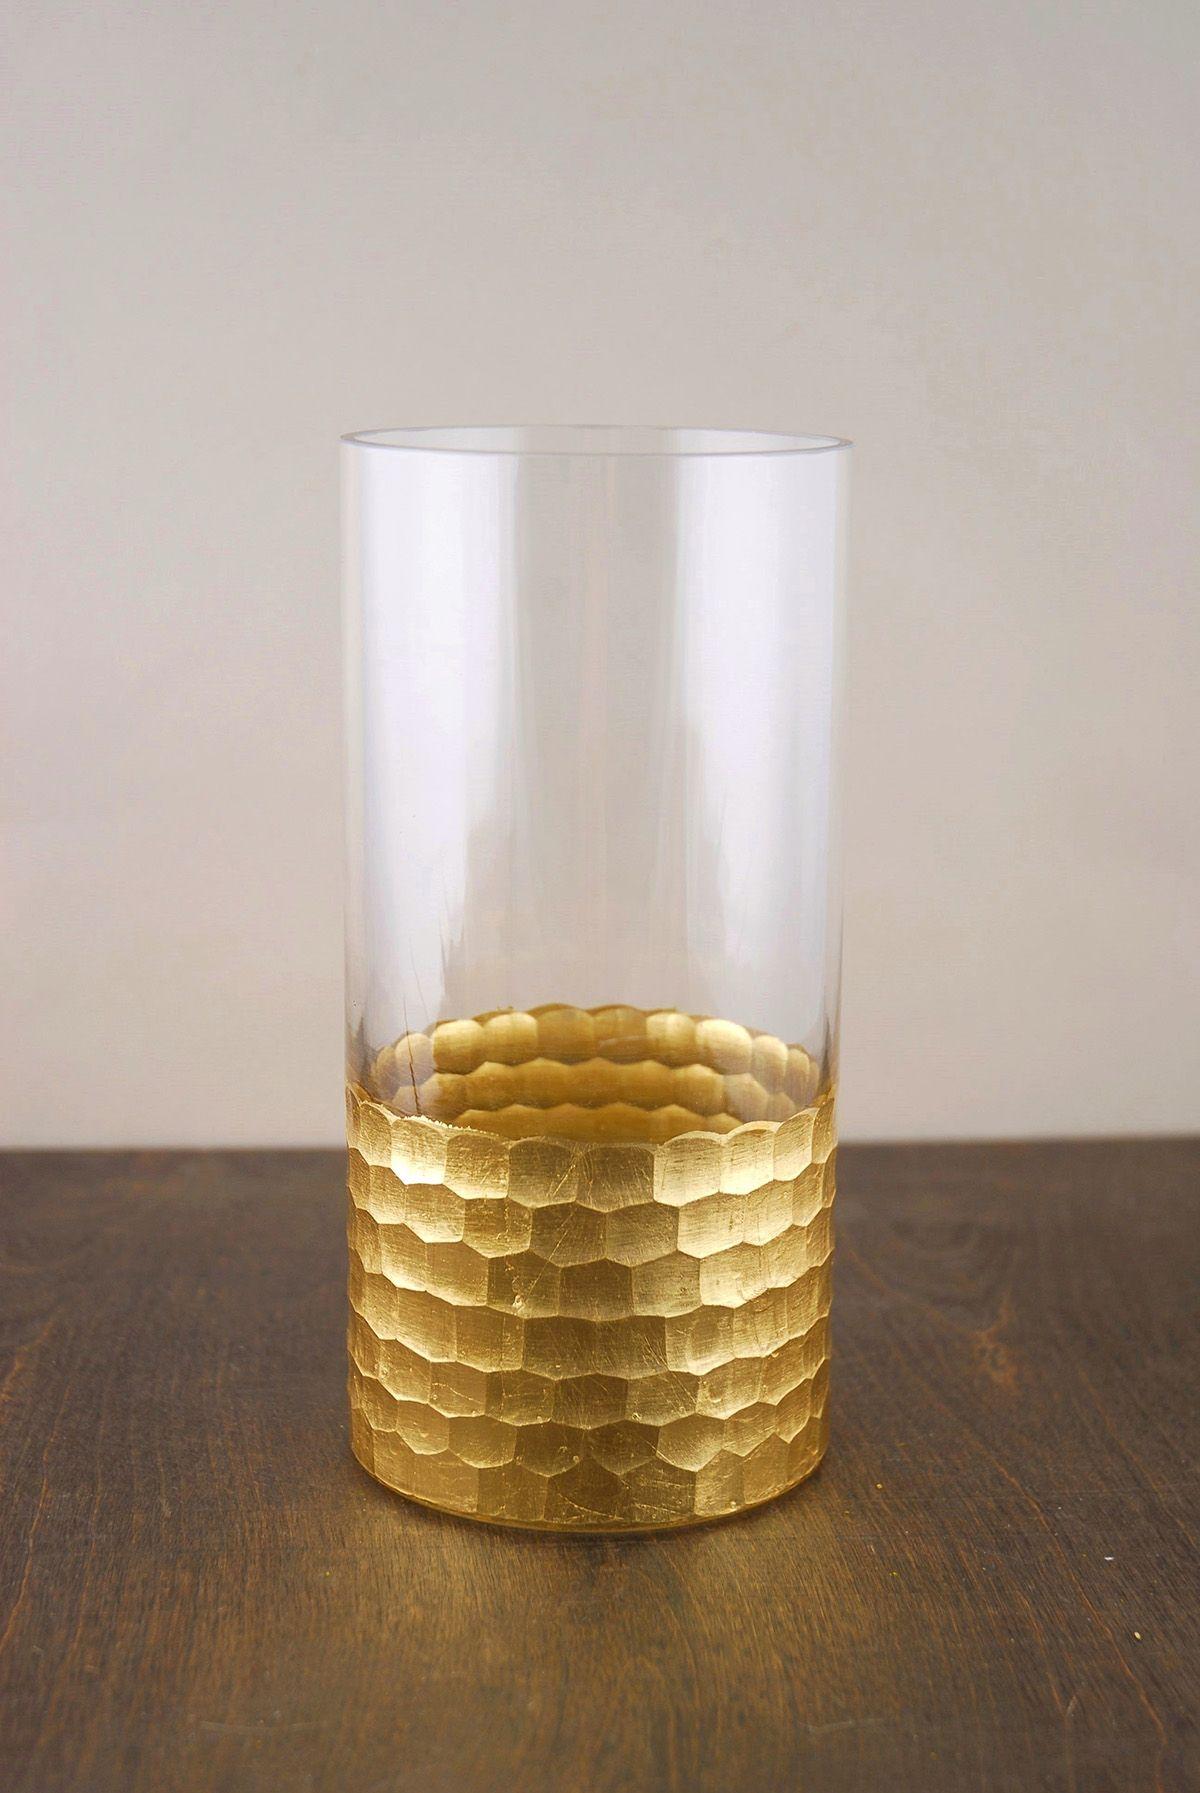 Gold Honeycomb Cylinder Vase 8 X 4 Honeycomb Vase Cylinder Vase Glass Cylinder Vases